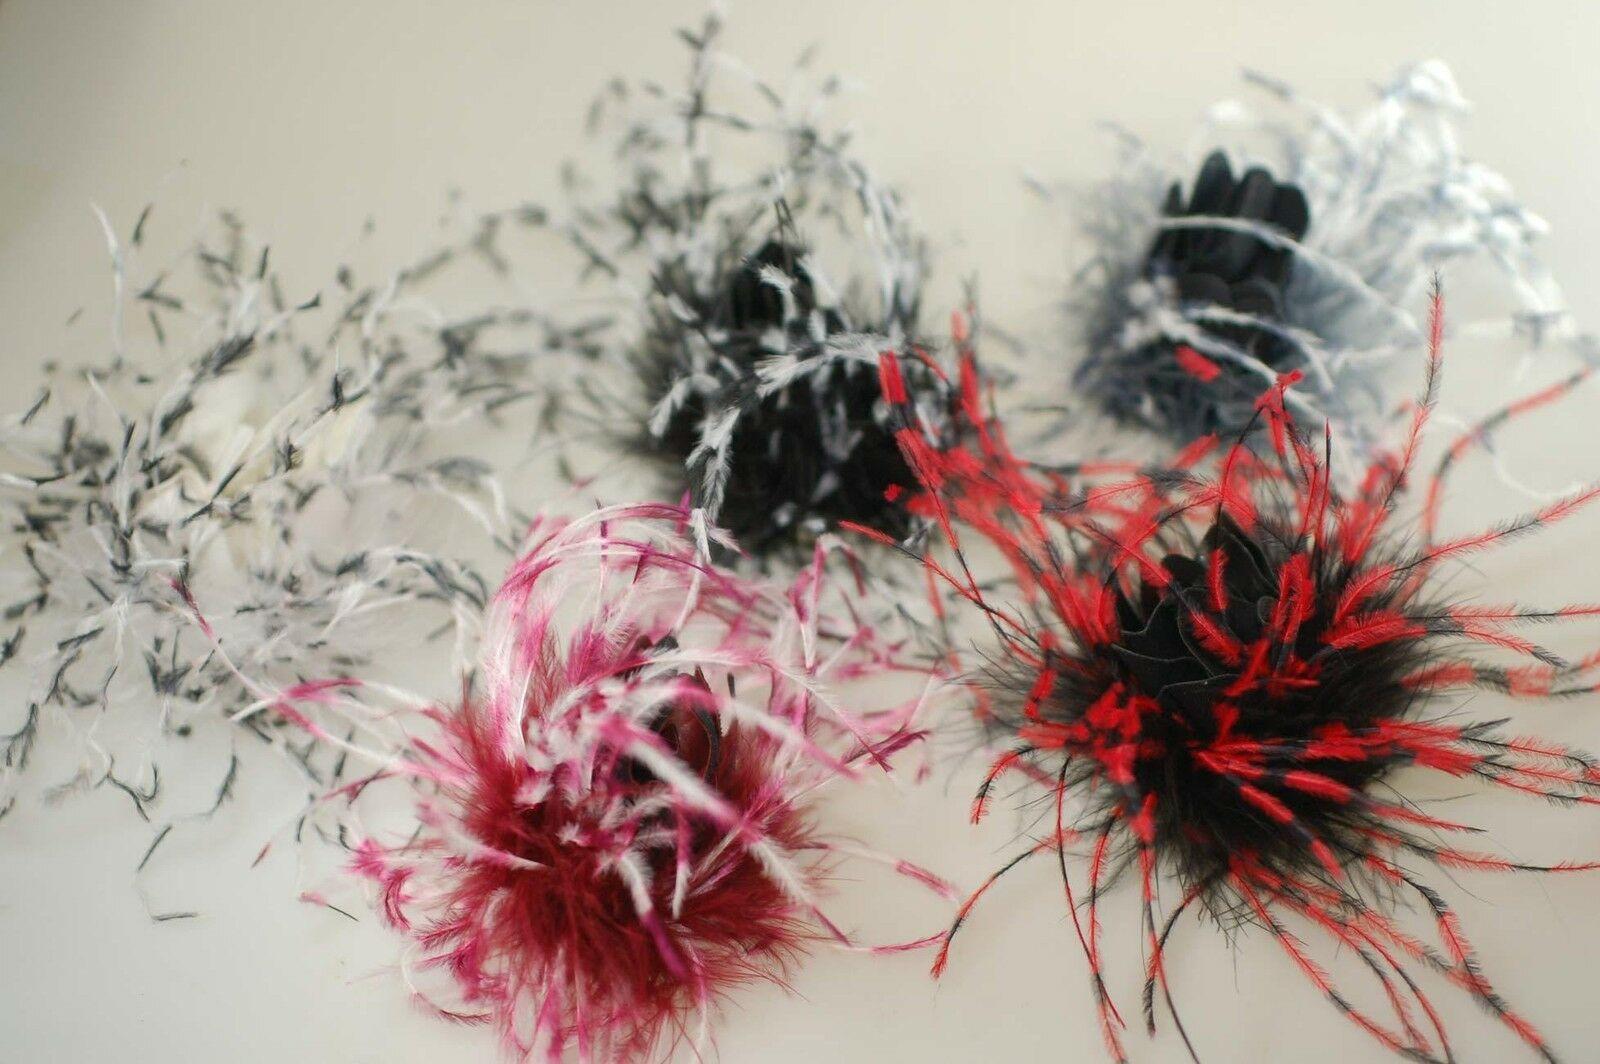 Neotrims Marabu Ostrich Feather Corsage Flower,Decoration,PU,Faux Leather Centre